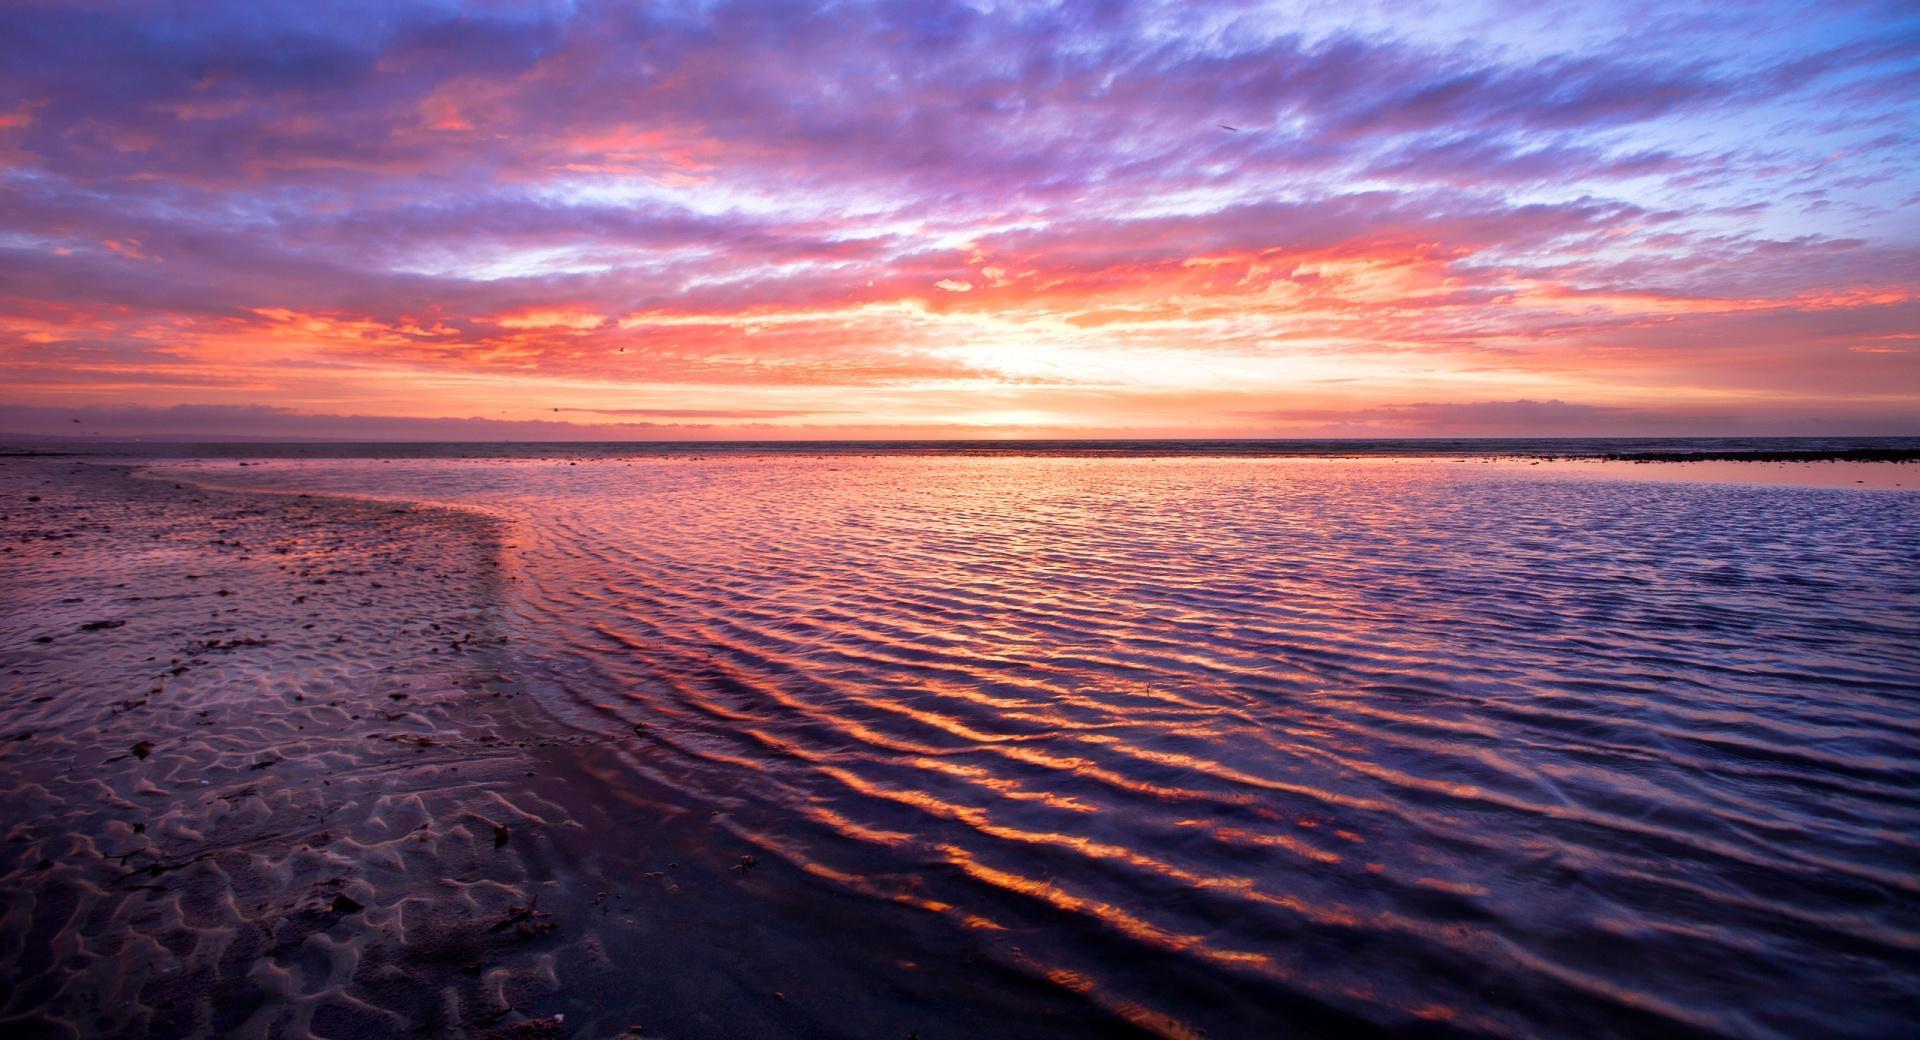 Sea Horizon, Sunset wallpapers HD quality